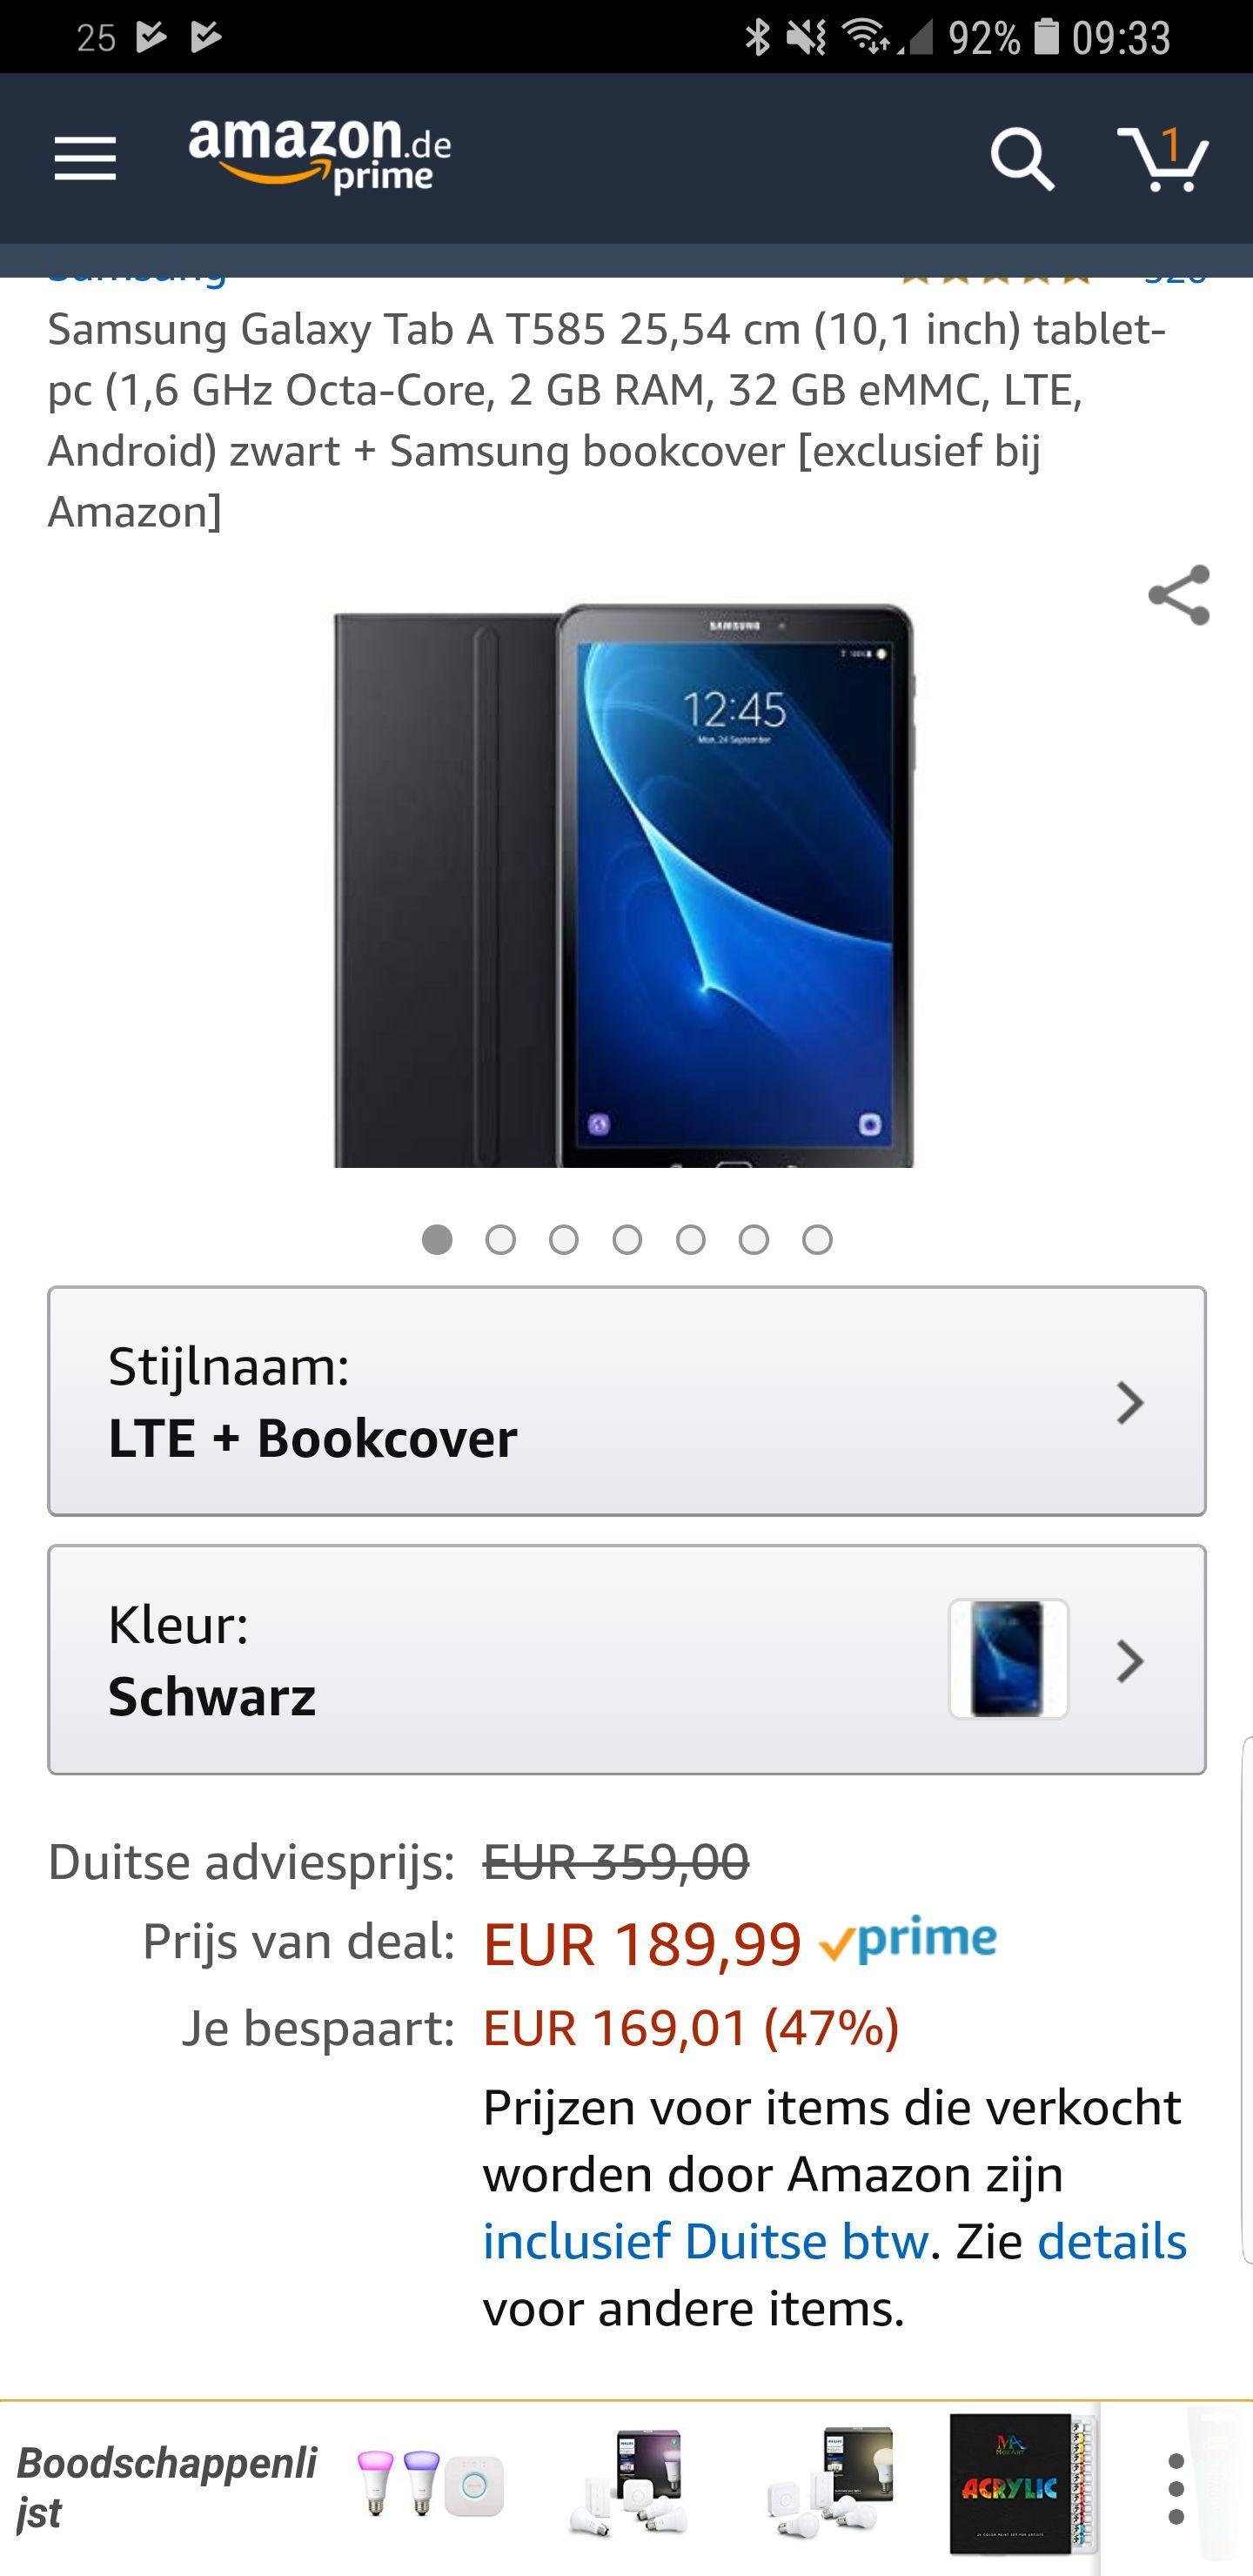 Samsung Galaxy tab A 10.1 wifi+3g/4g incl cover